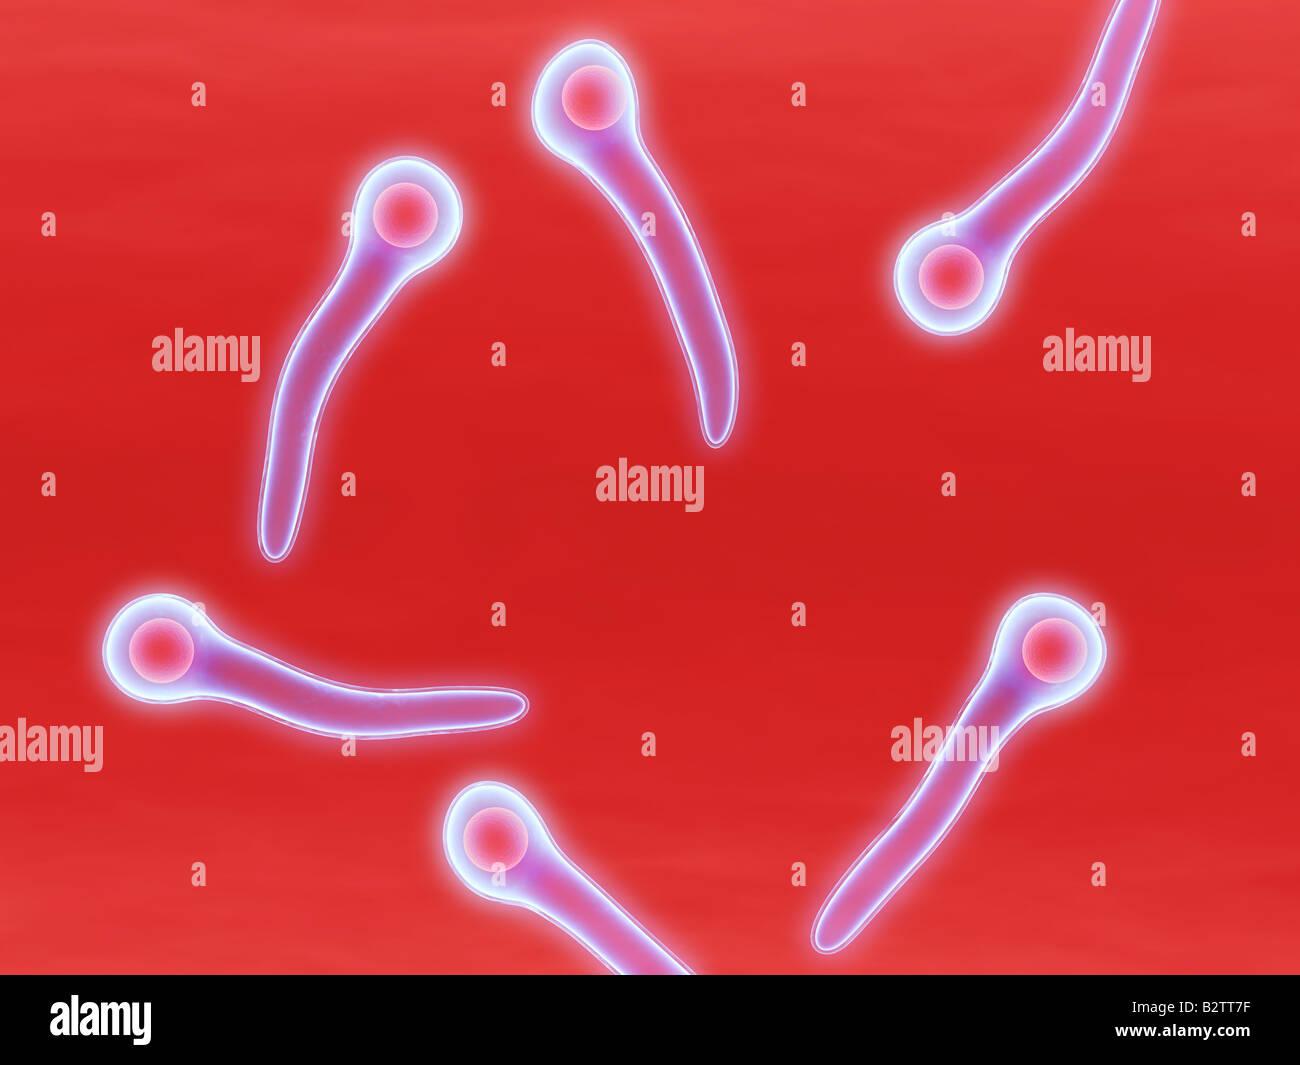 tetanus bacteria Stock Photo, Royalty Free Image: 18985555 ...